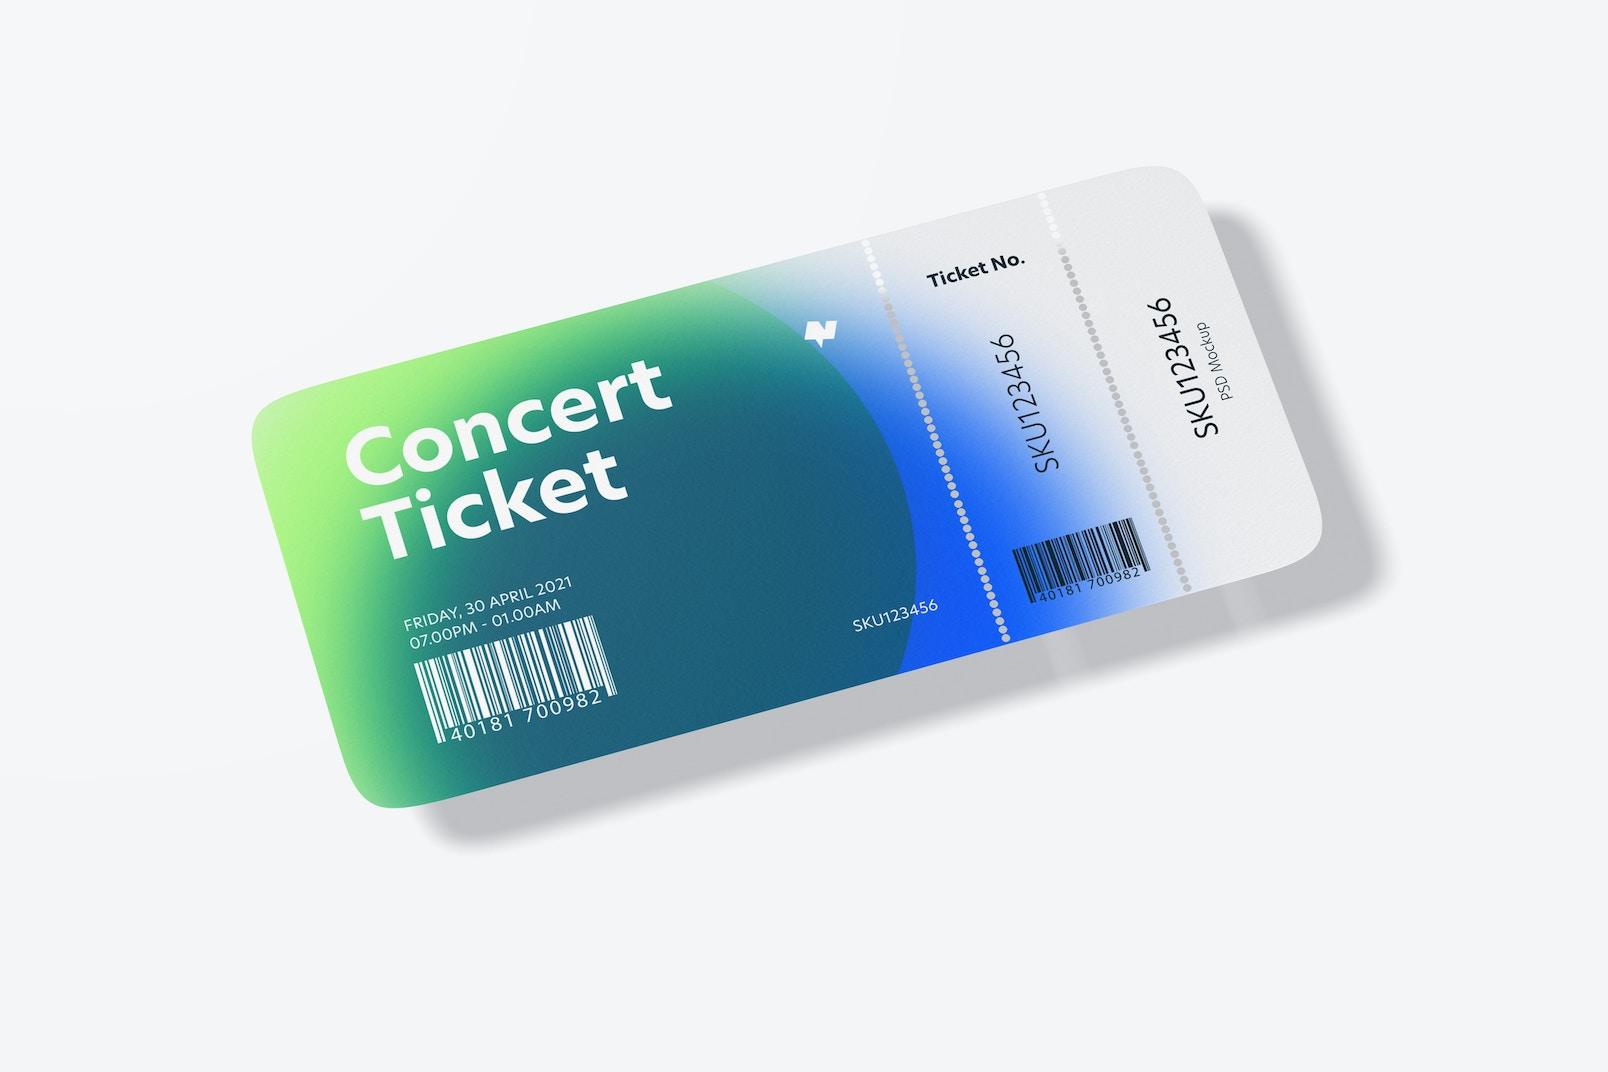 Concert Ticket Mockup